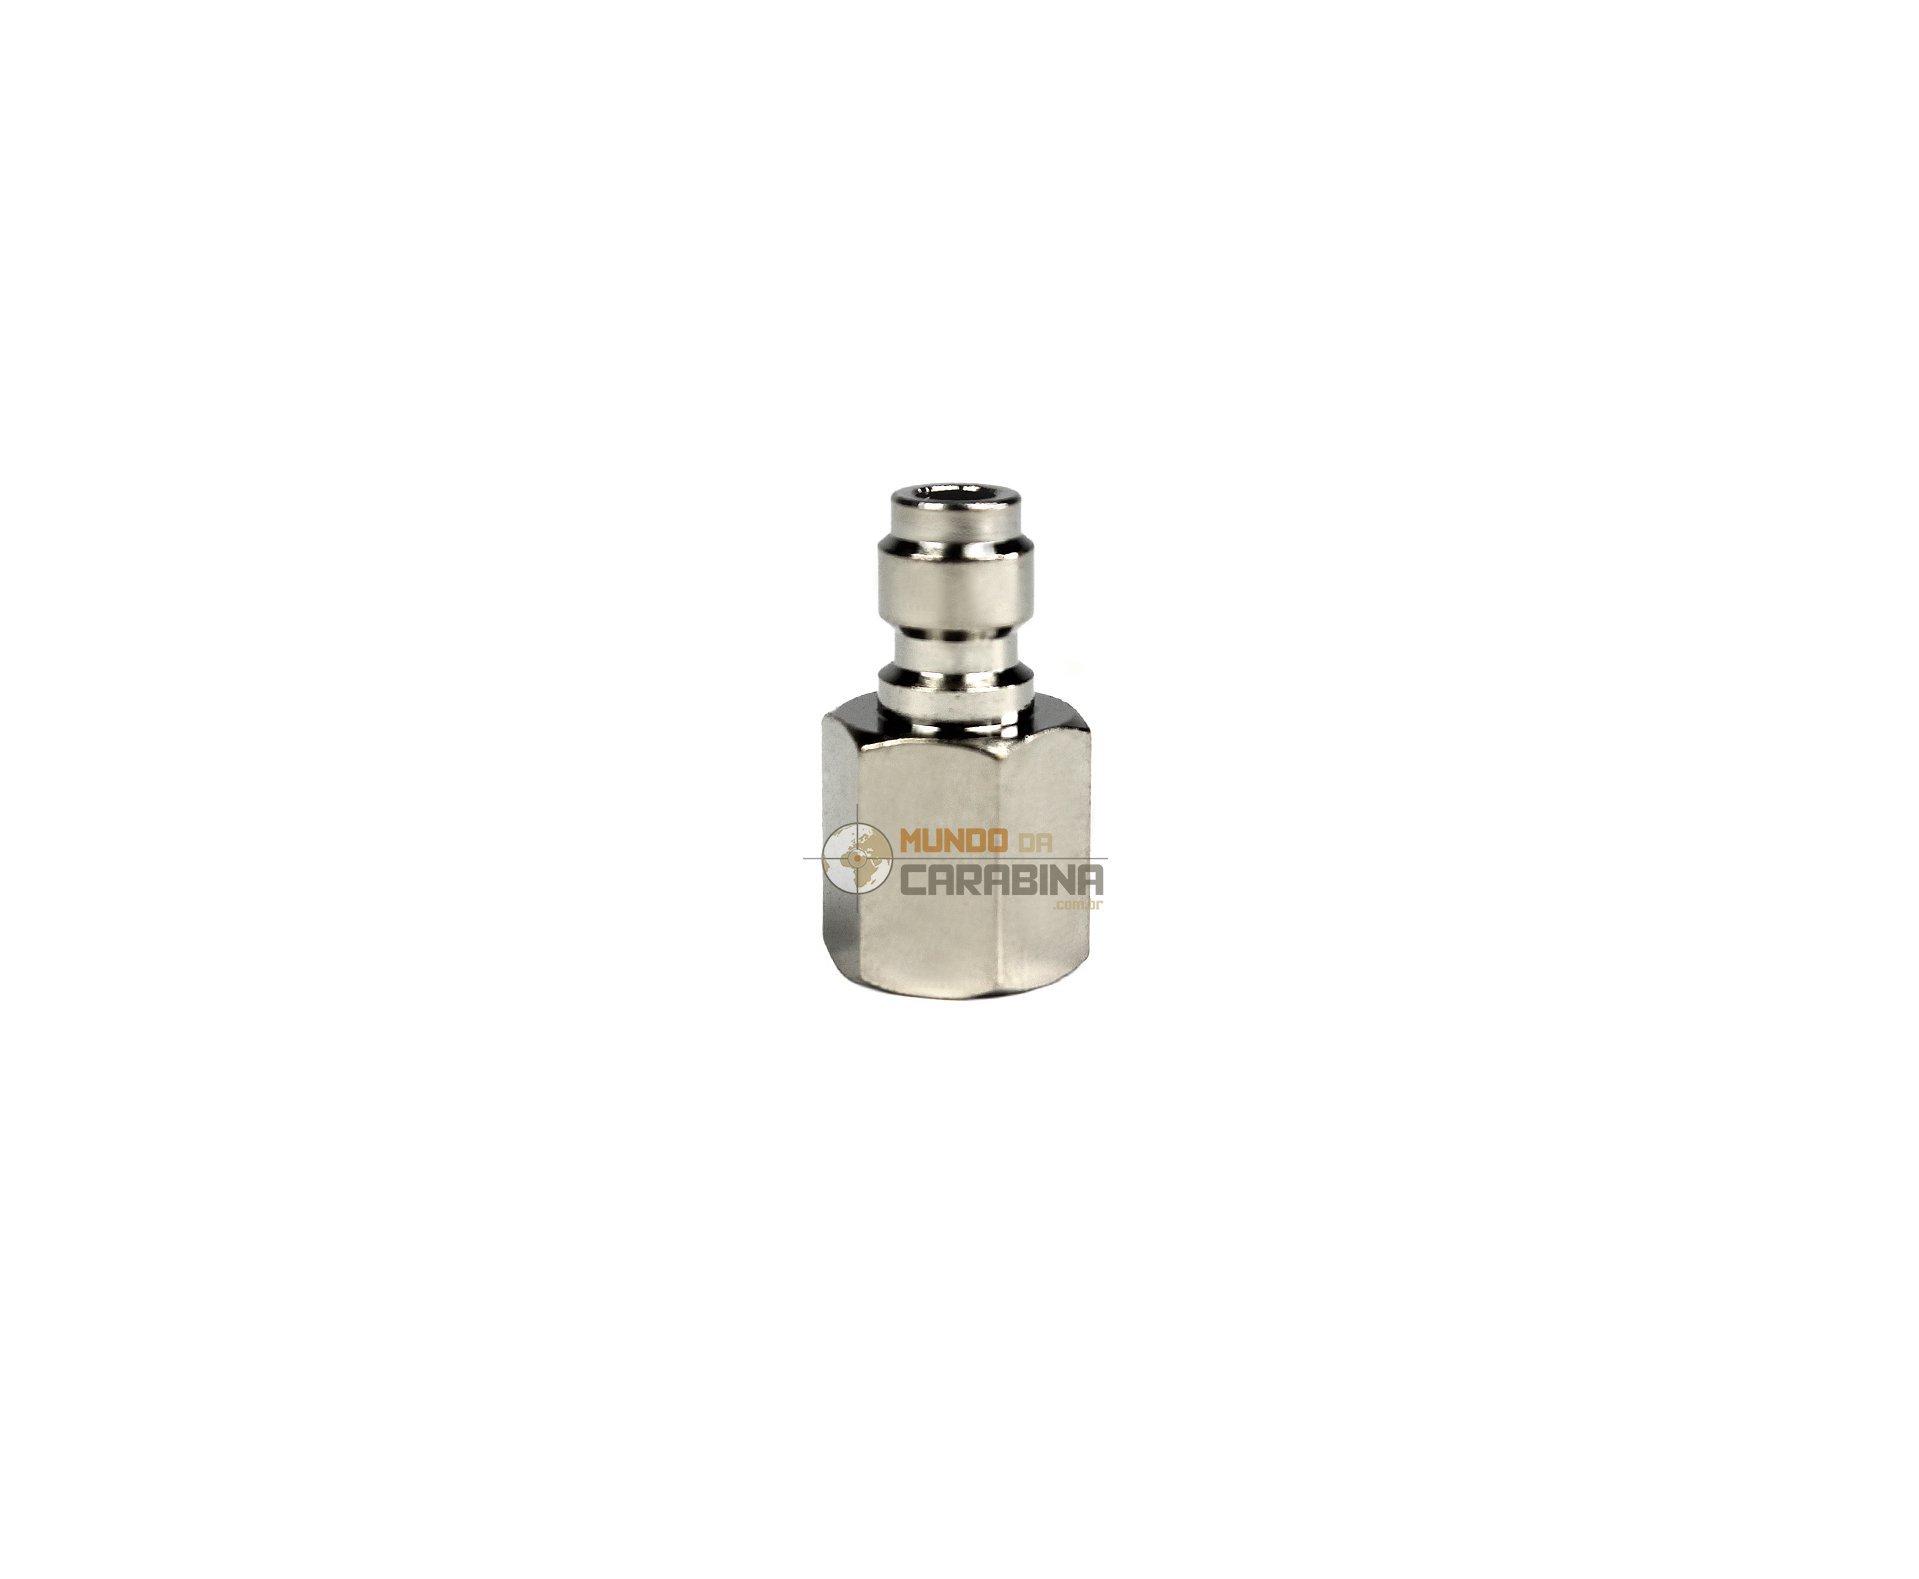 Carabina De Pressão Gamo Pcp Chacal Black Whisper Polimero 5.5 + Luneta 4x32 Gold + Bomba Manual